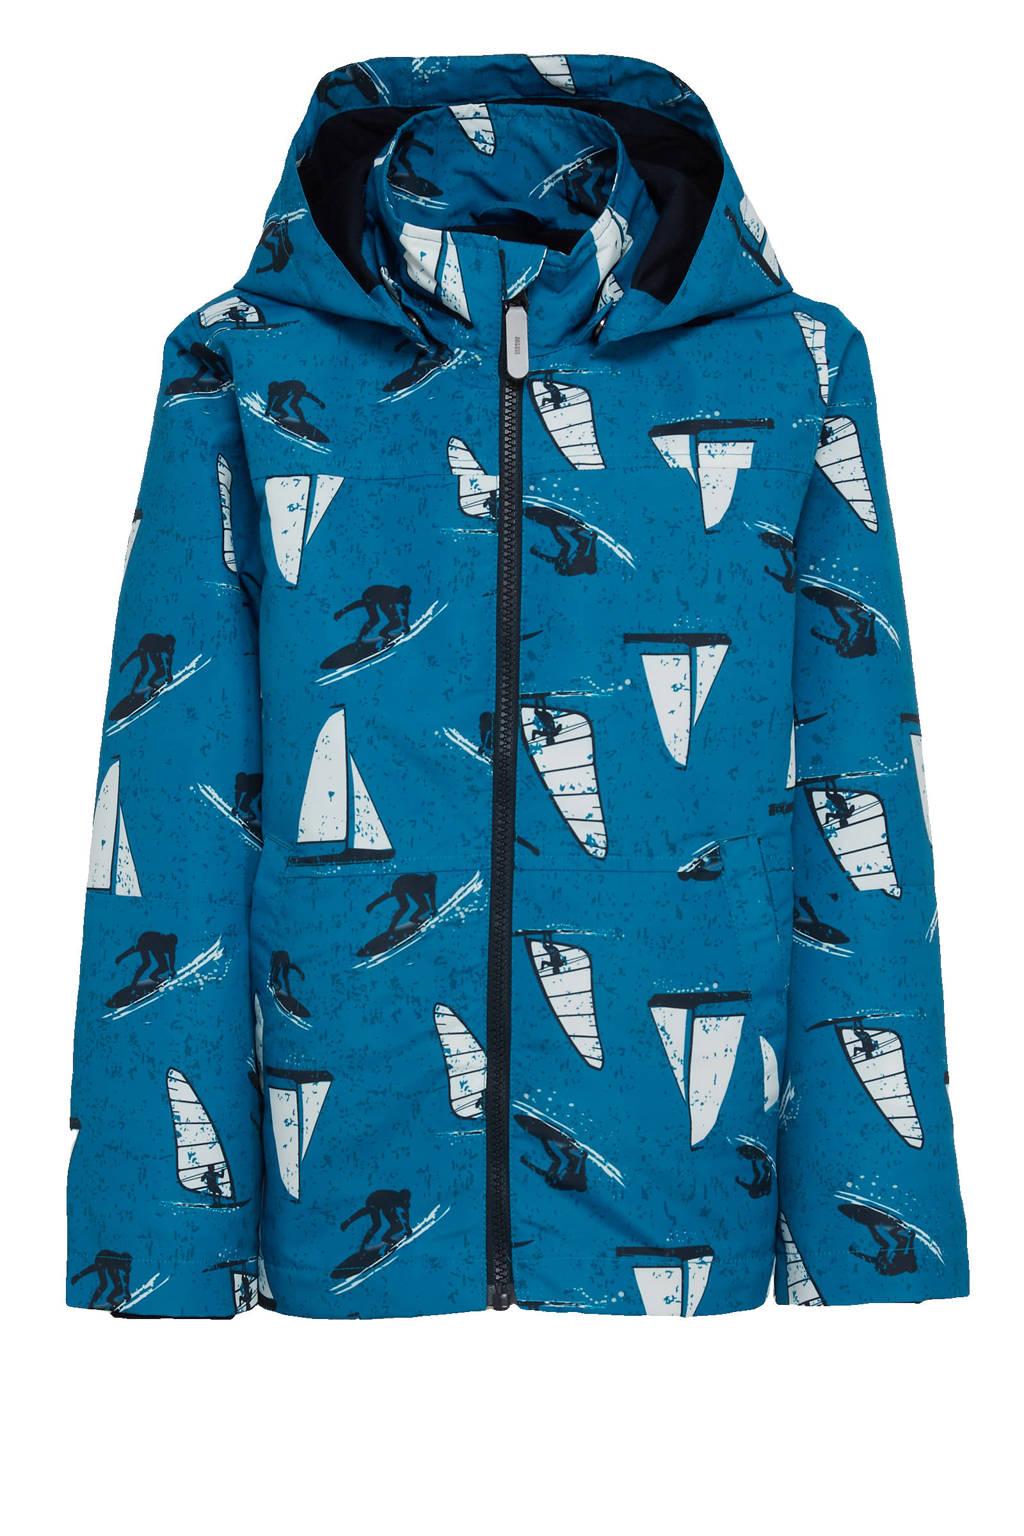 NAME IT KIDS  zomerjas Max met all over print blauw, Blauw